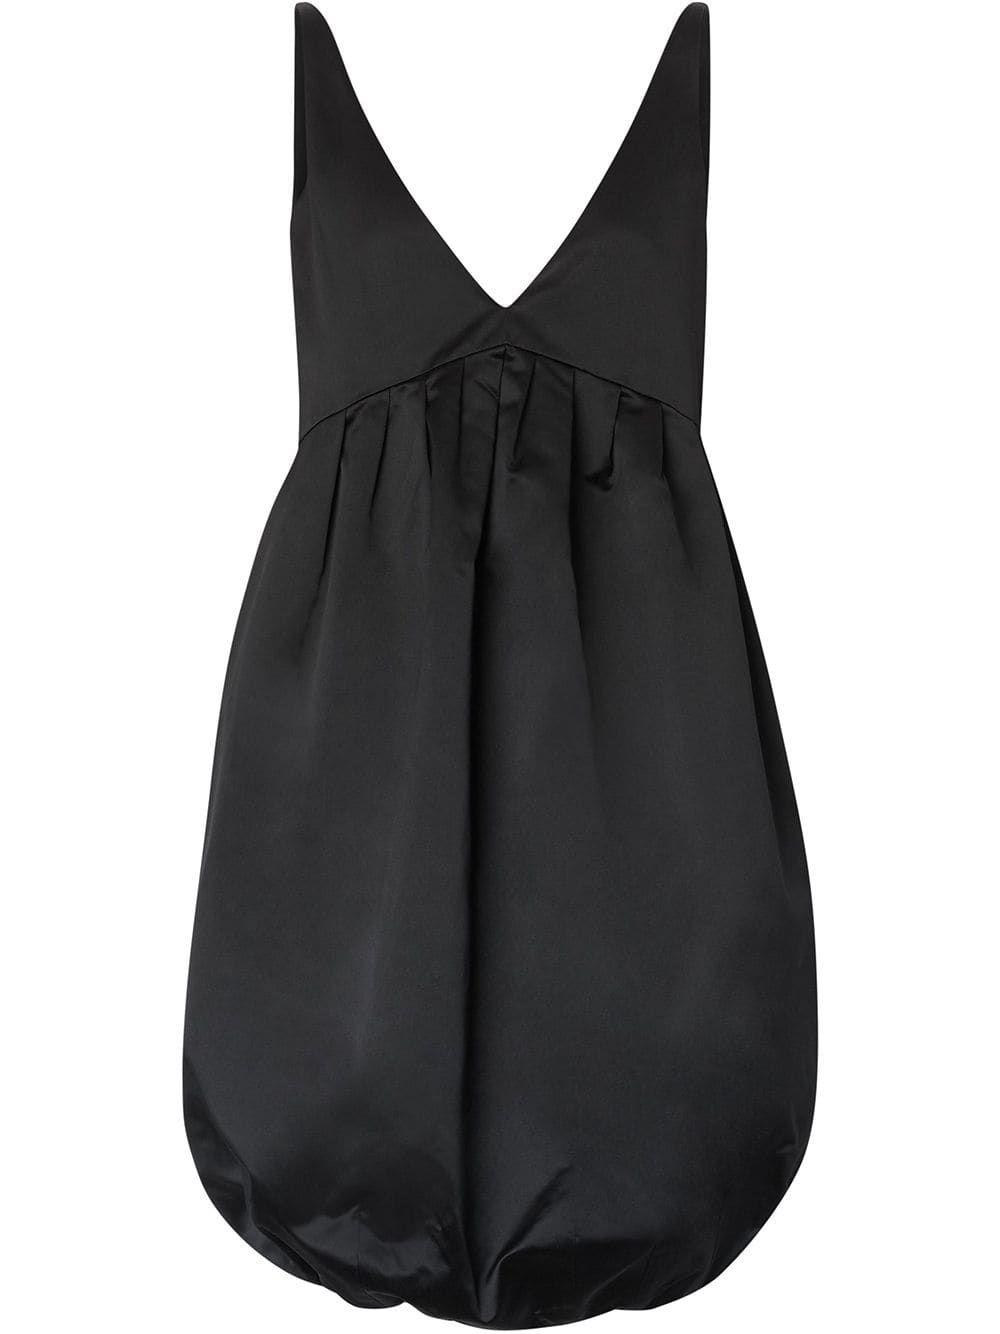 Burberry Duchess Satin Bubble Hem Dress - Black #duchesssatin